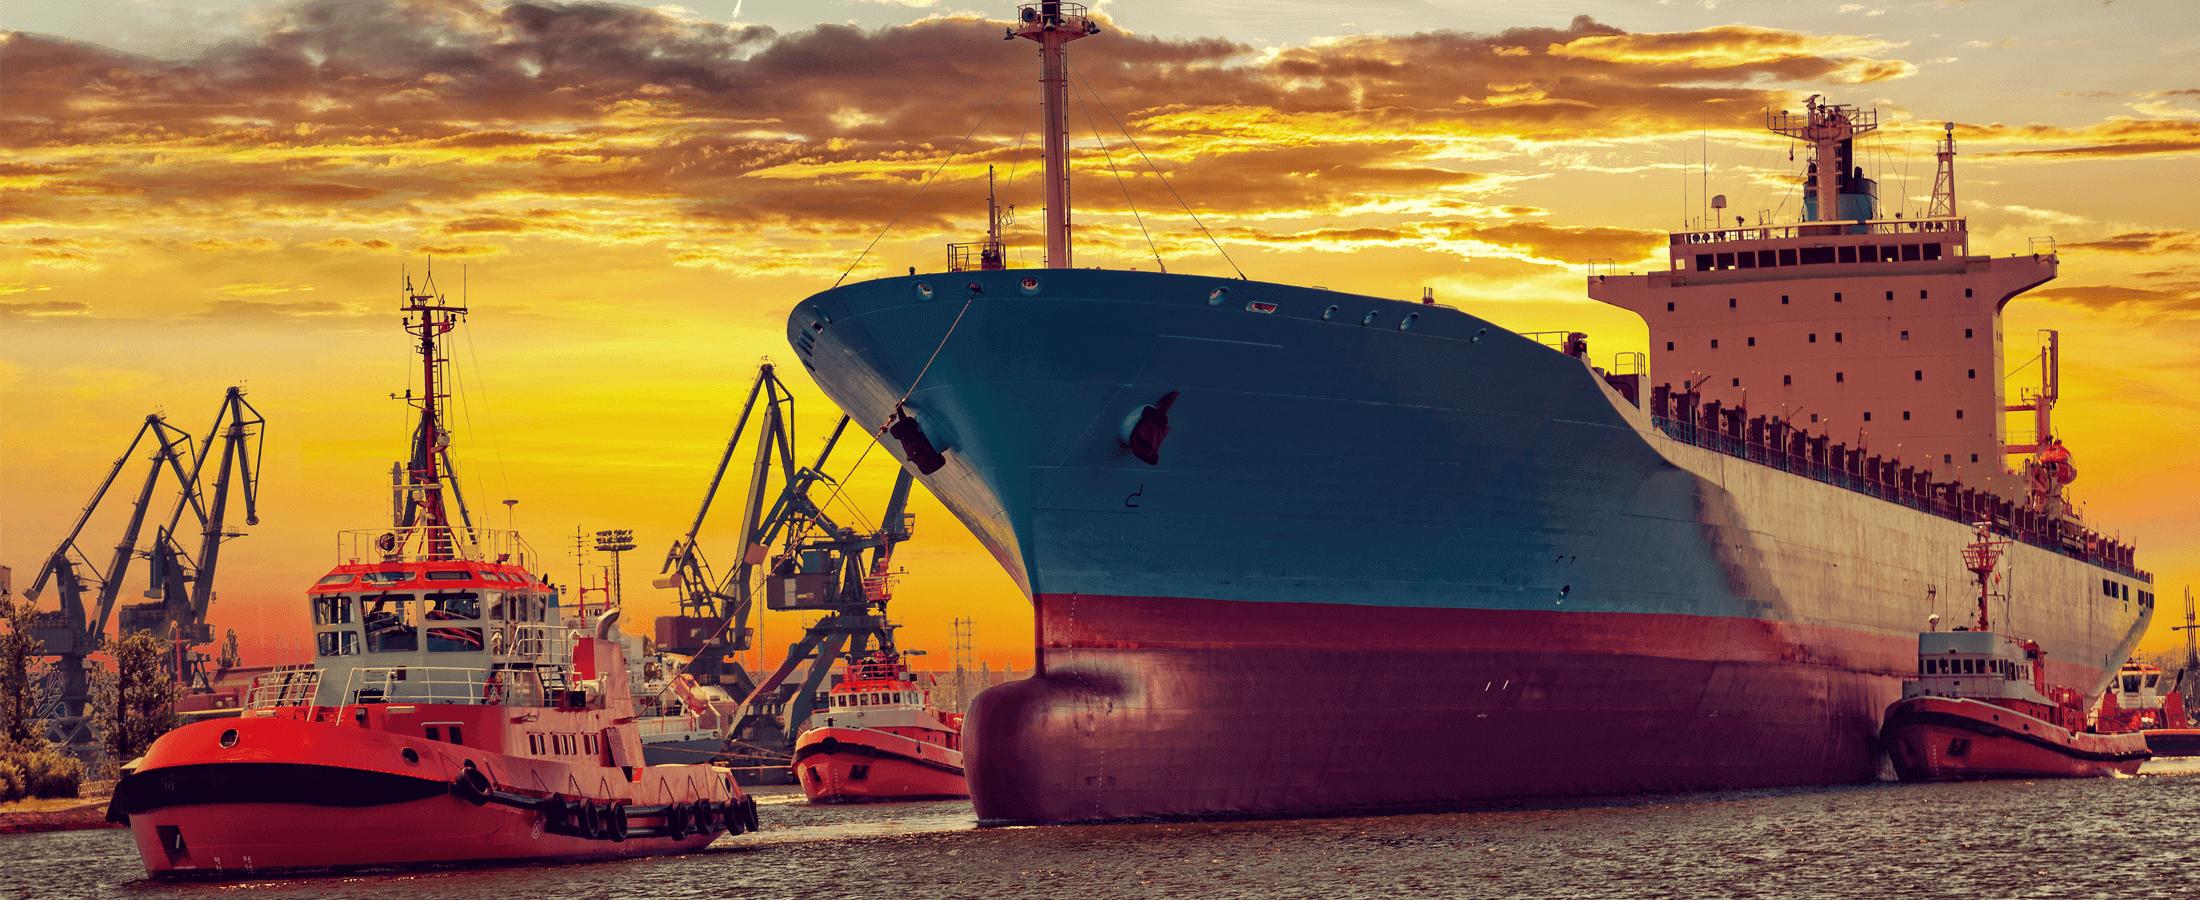 ship + tugboat